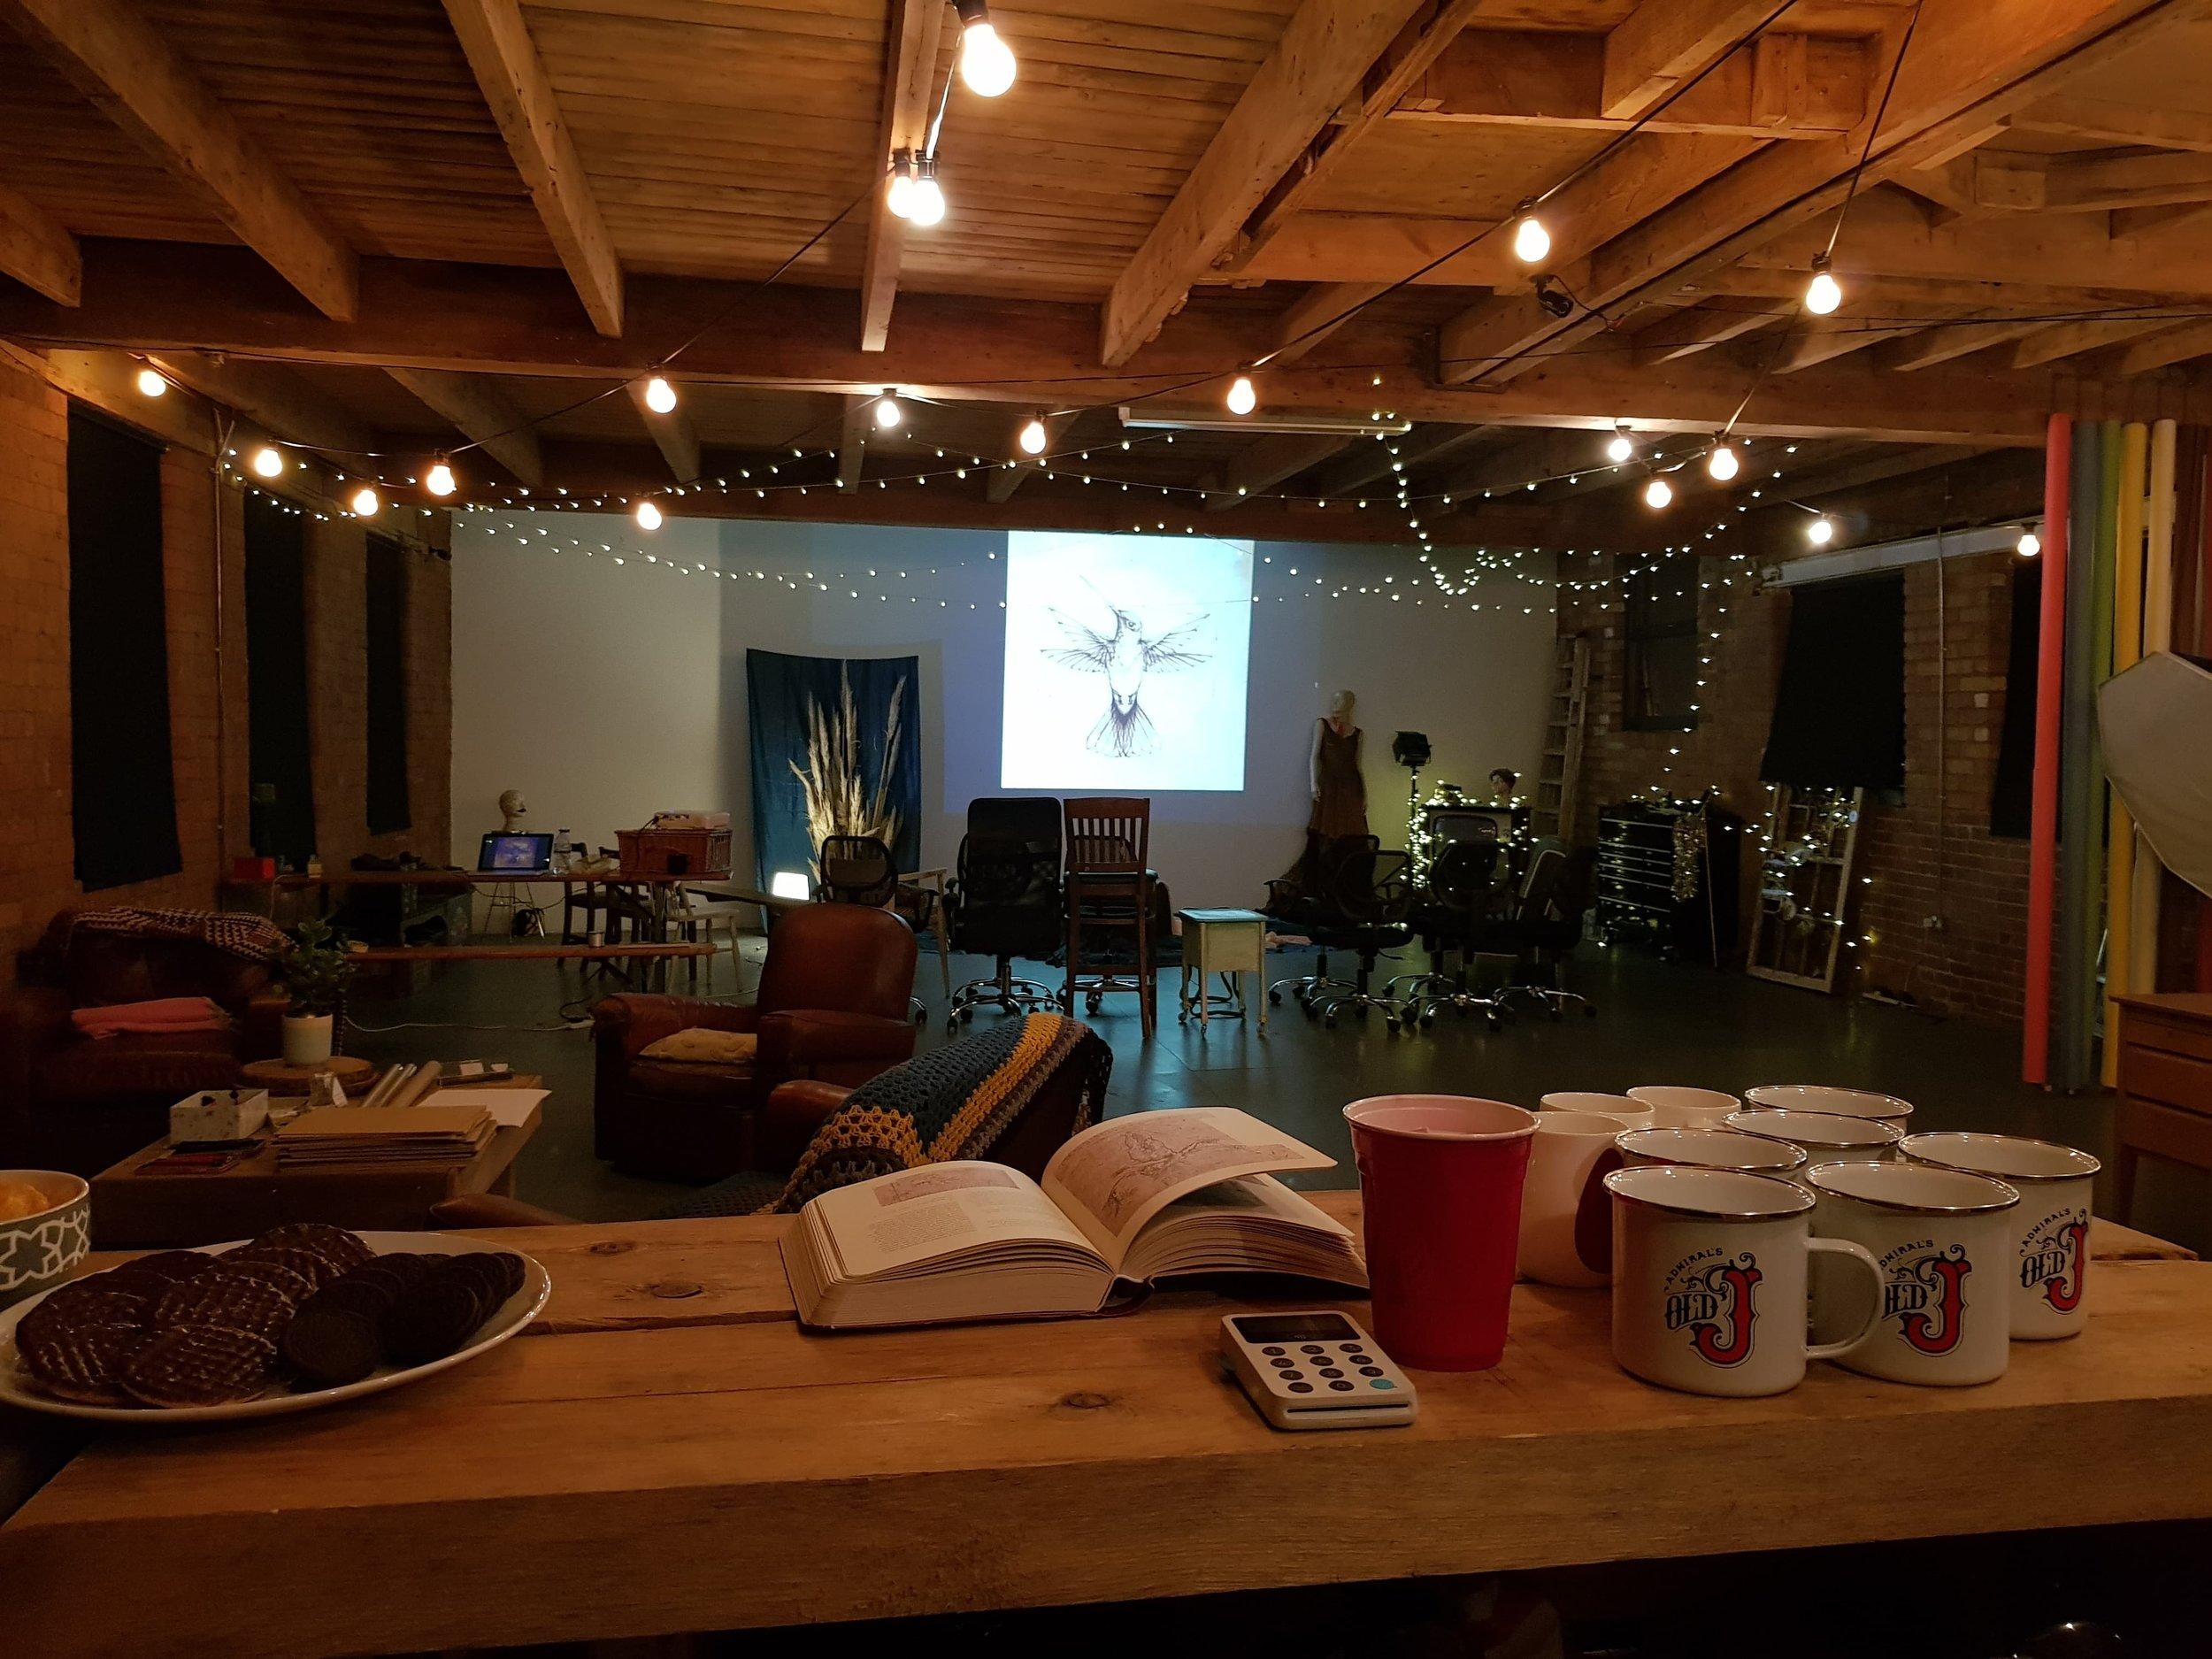 The Old Workshop Studio